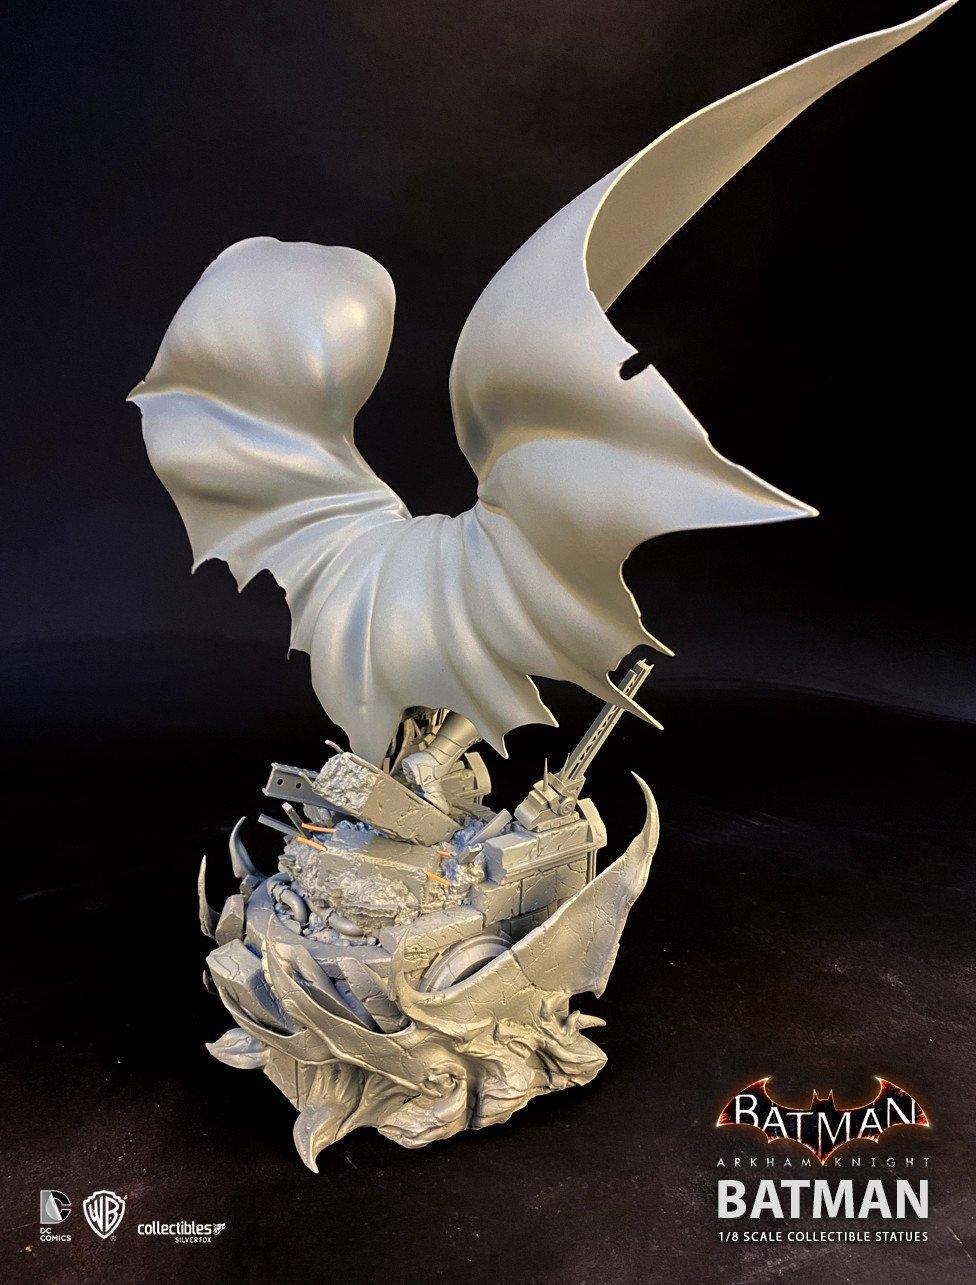 Batman siver fox collectibles batman arkham knight 1 8 scale statue4